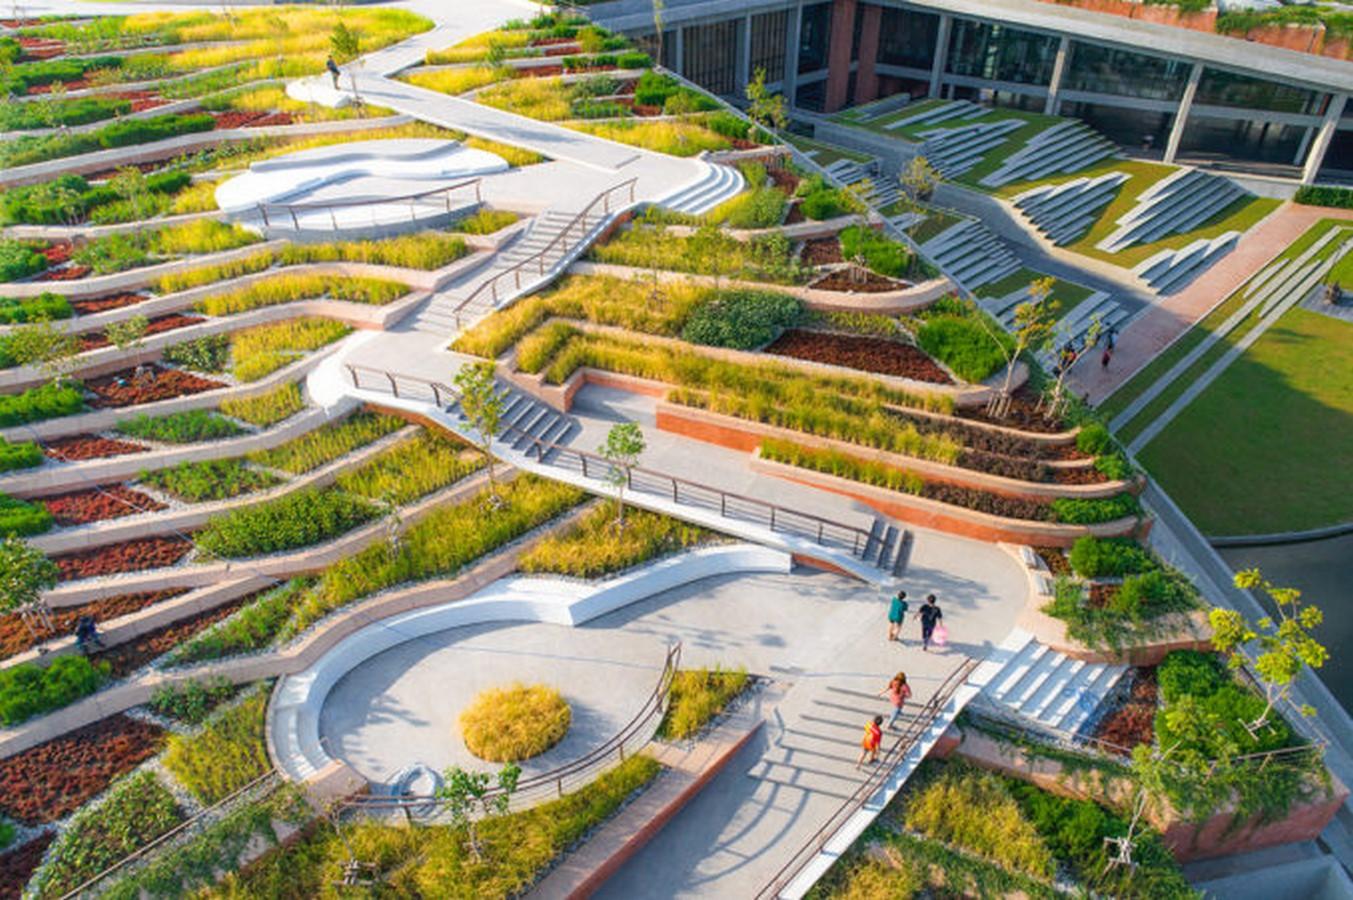 Thammasat University Urban Rooftop Farm - Sheet3